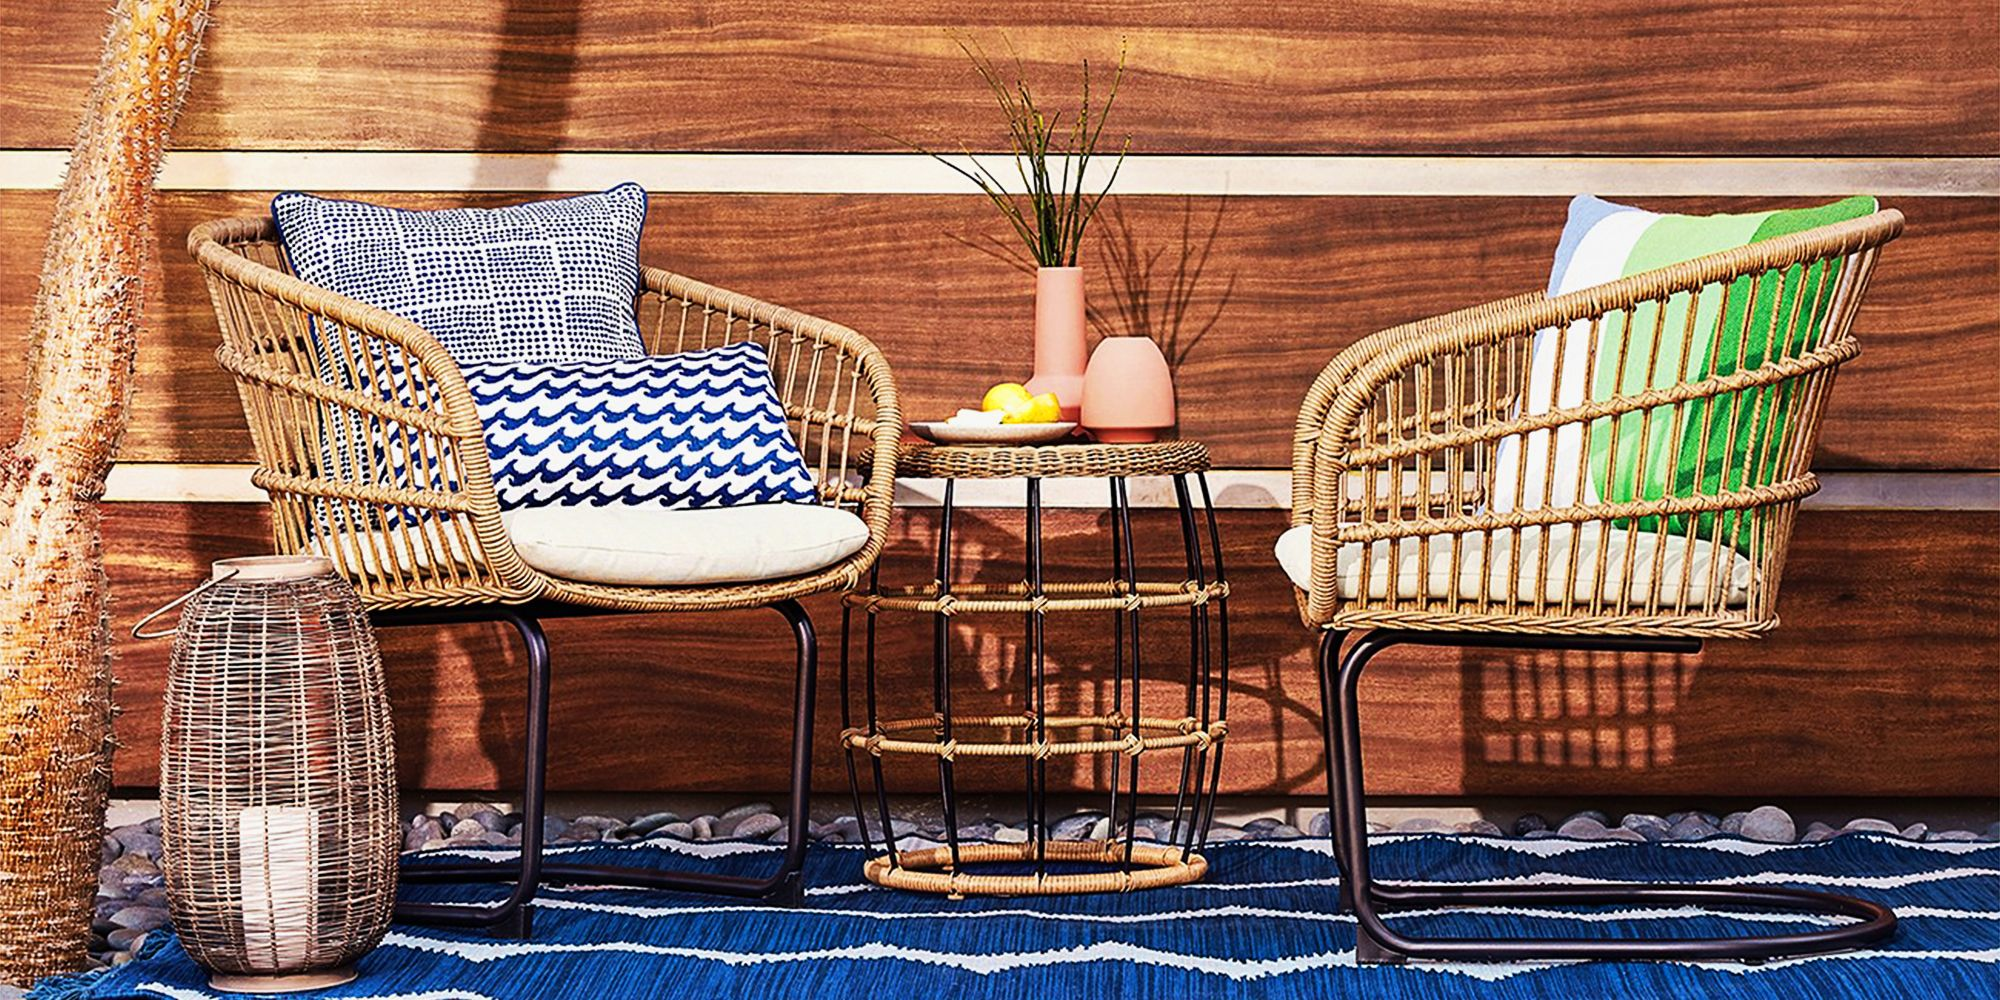 bistro table sets outdoors best 2018 & 11 Best Outdoor Bistro Sets for Summer 2018 u2013 Bistro Style Tables ...